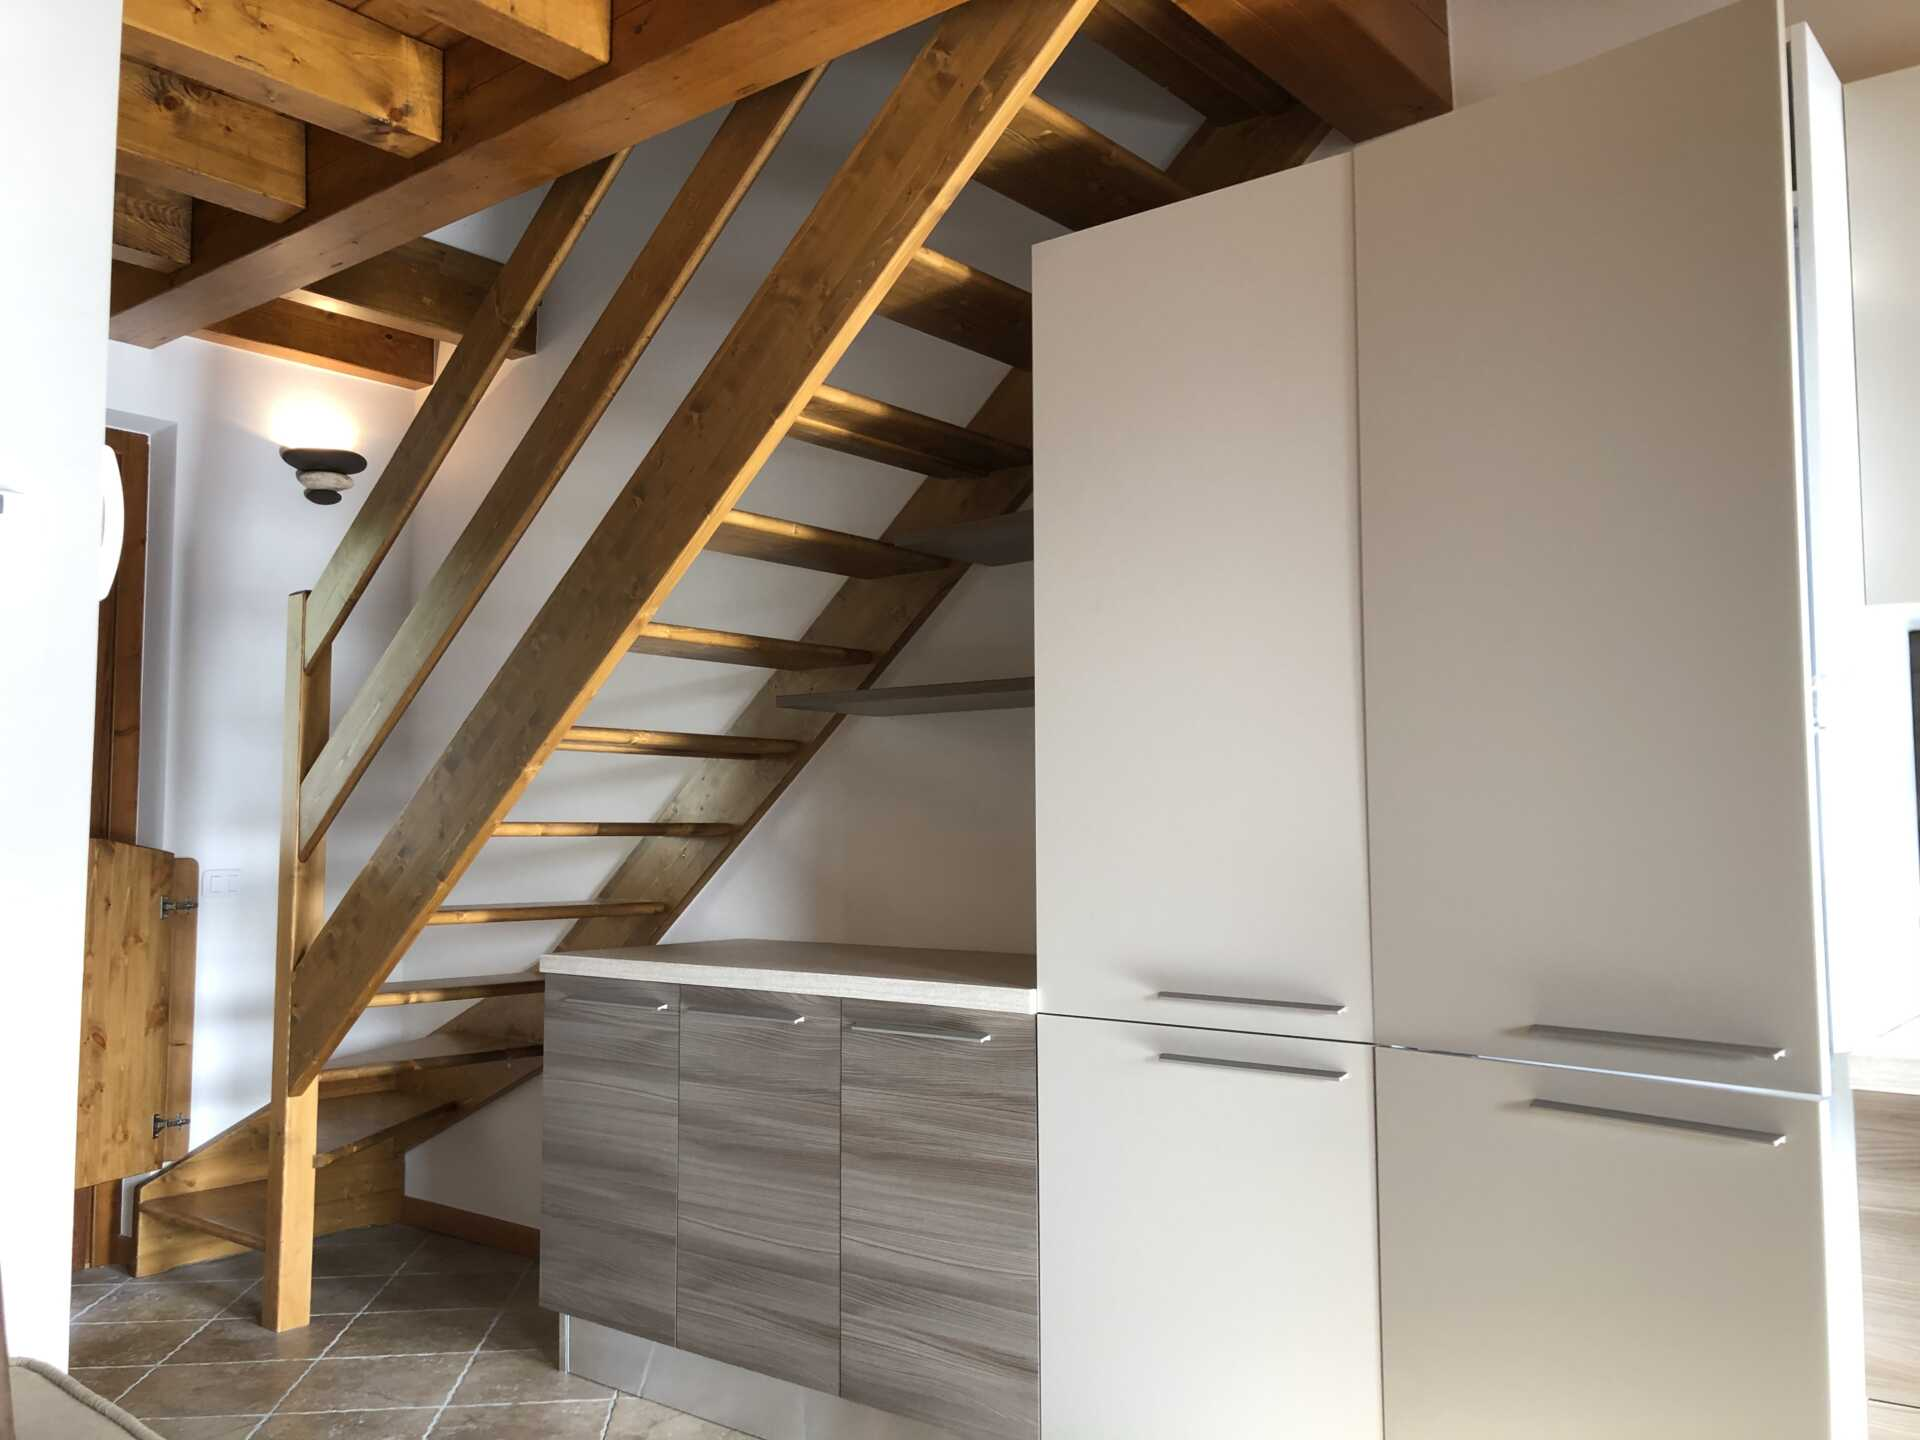 Casa-vacanze-in-vendita-appartamento-a-Dossena (1)